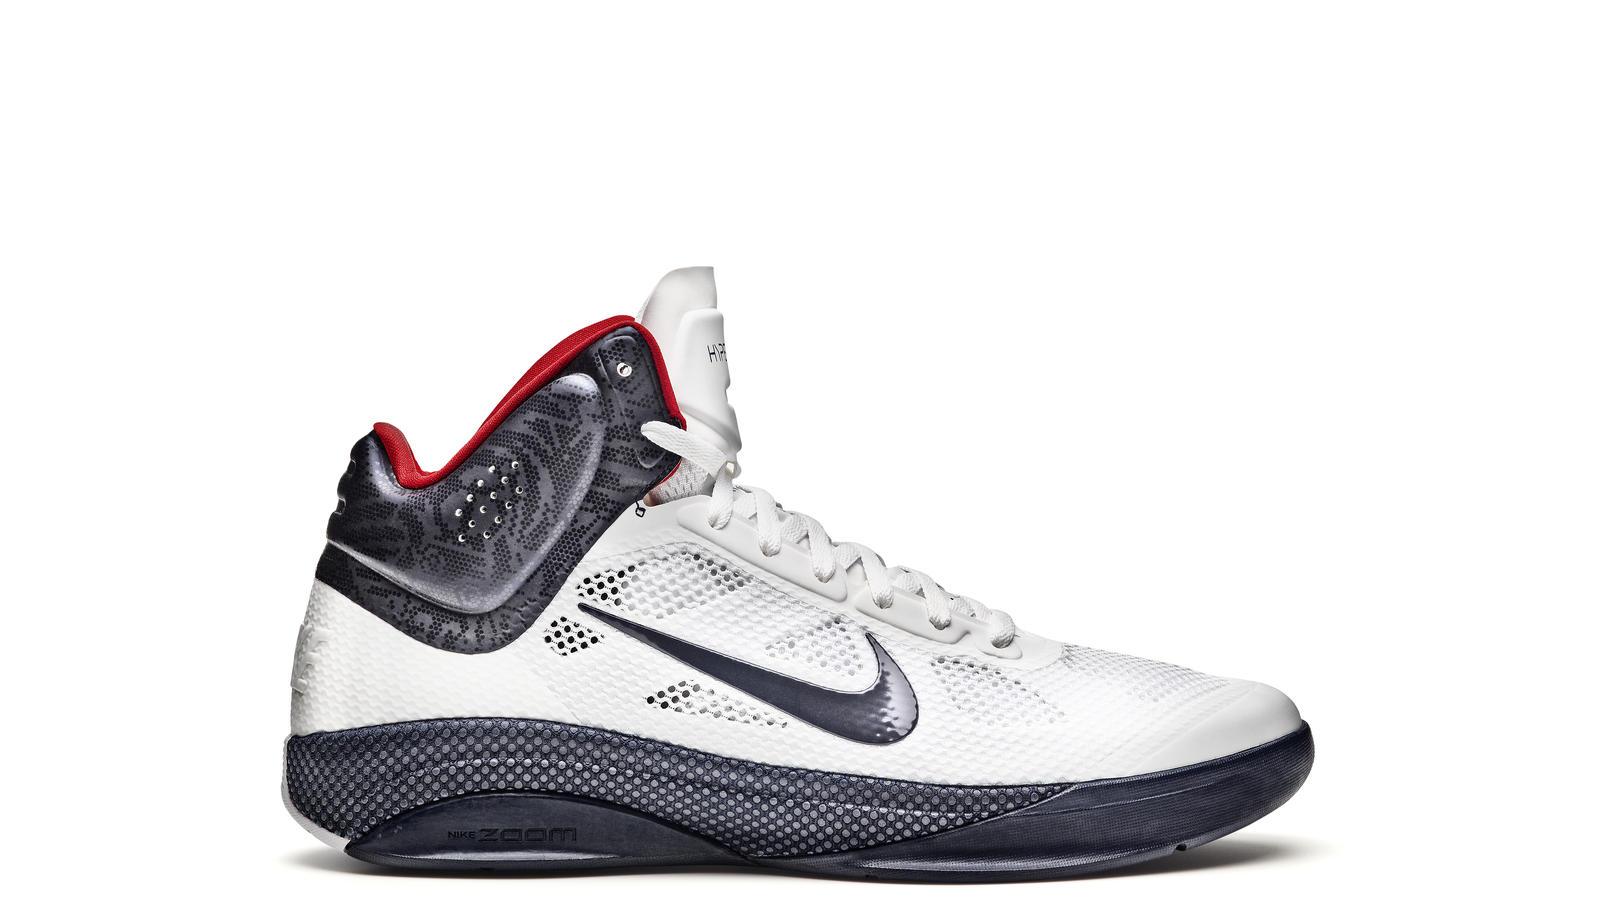 Nike Zoom Hyperfuse - Nike News